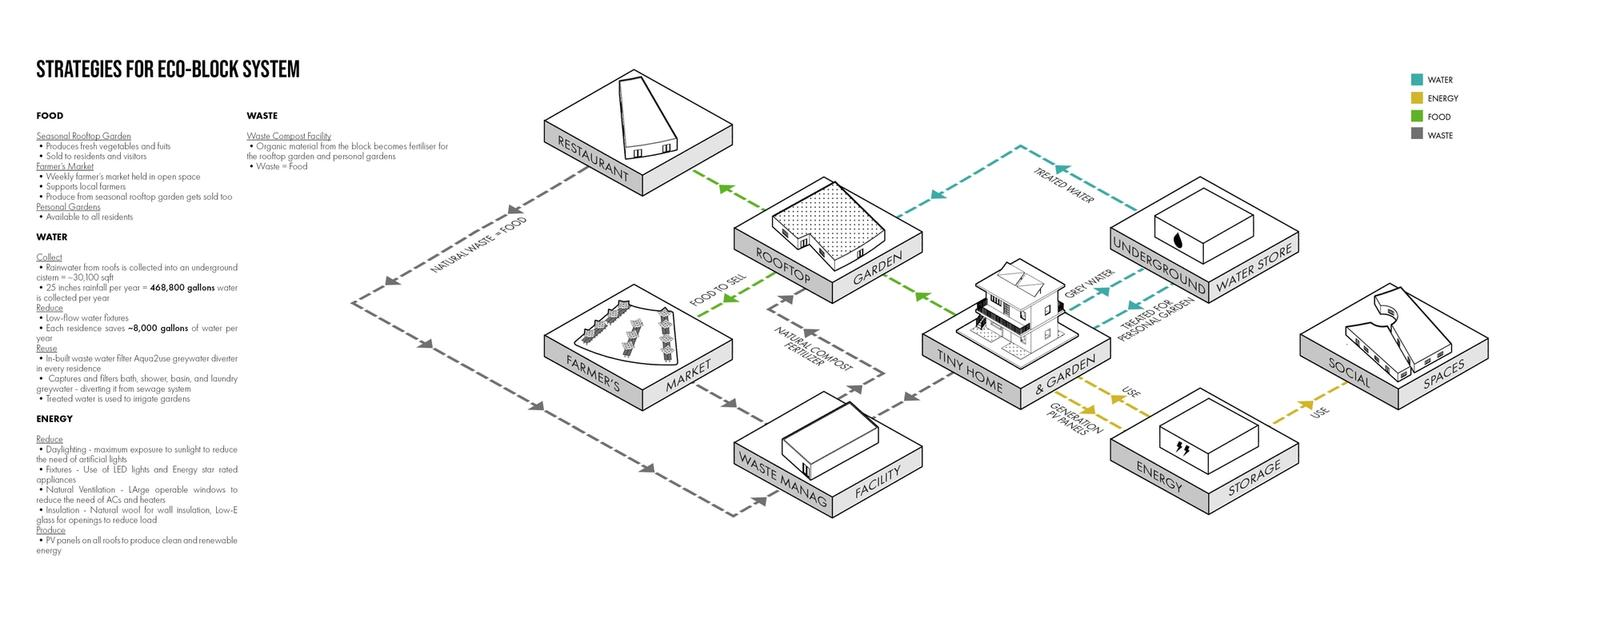 Eco-Block - System strategies